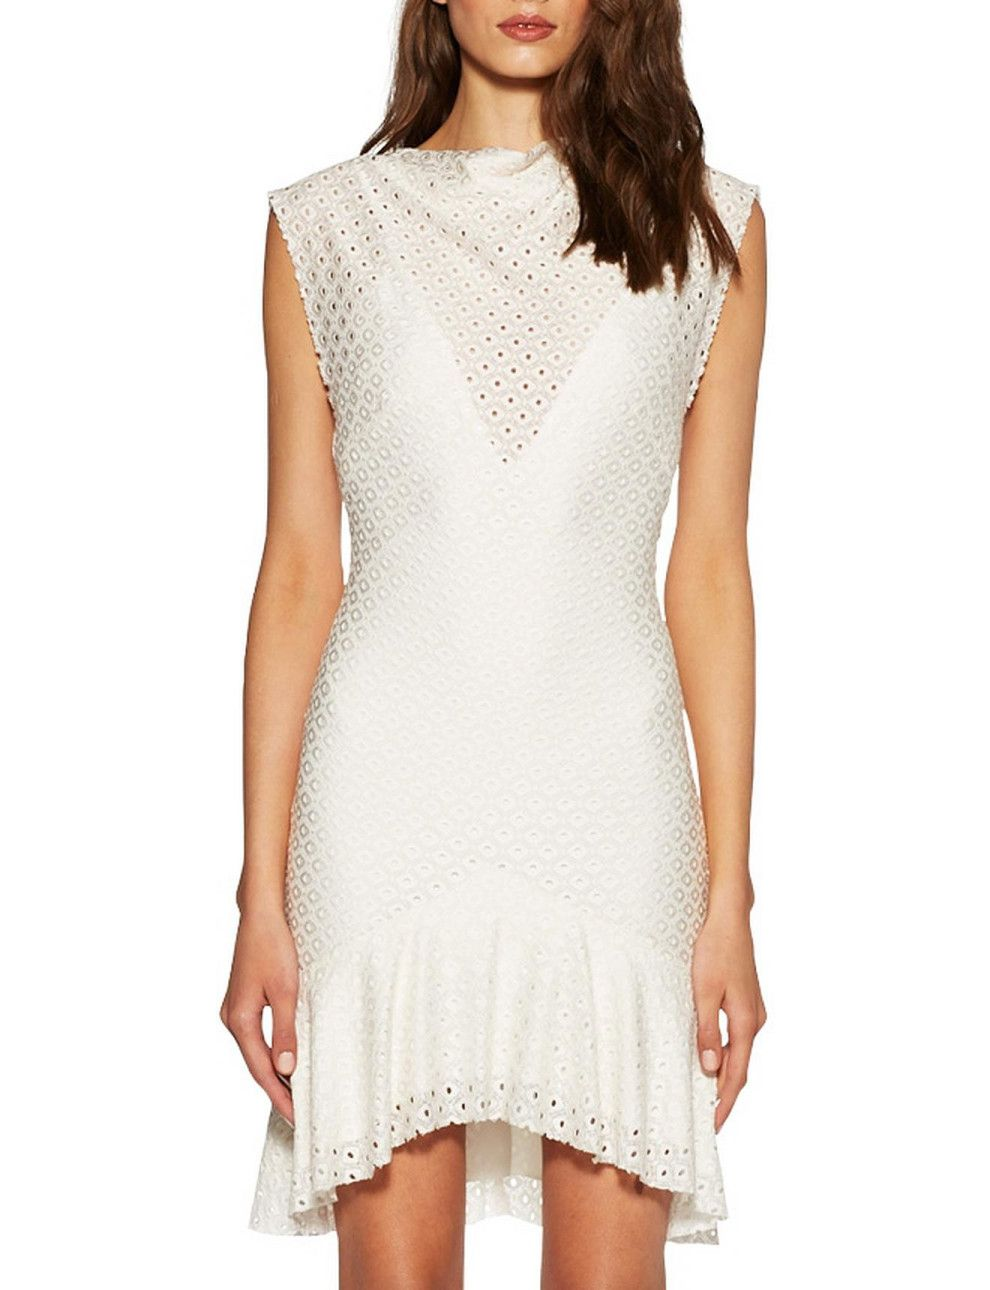 White dress david jones - Nazar Dress David Jones